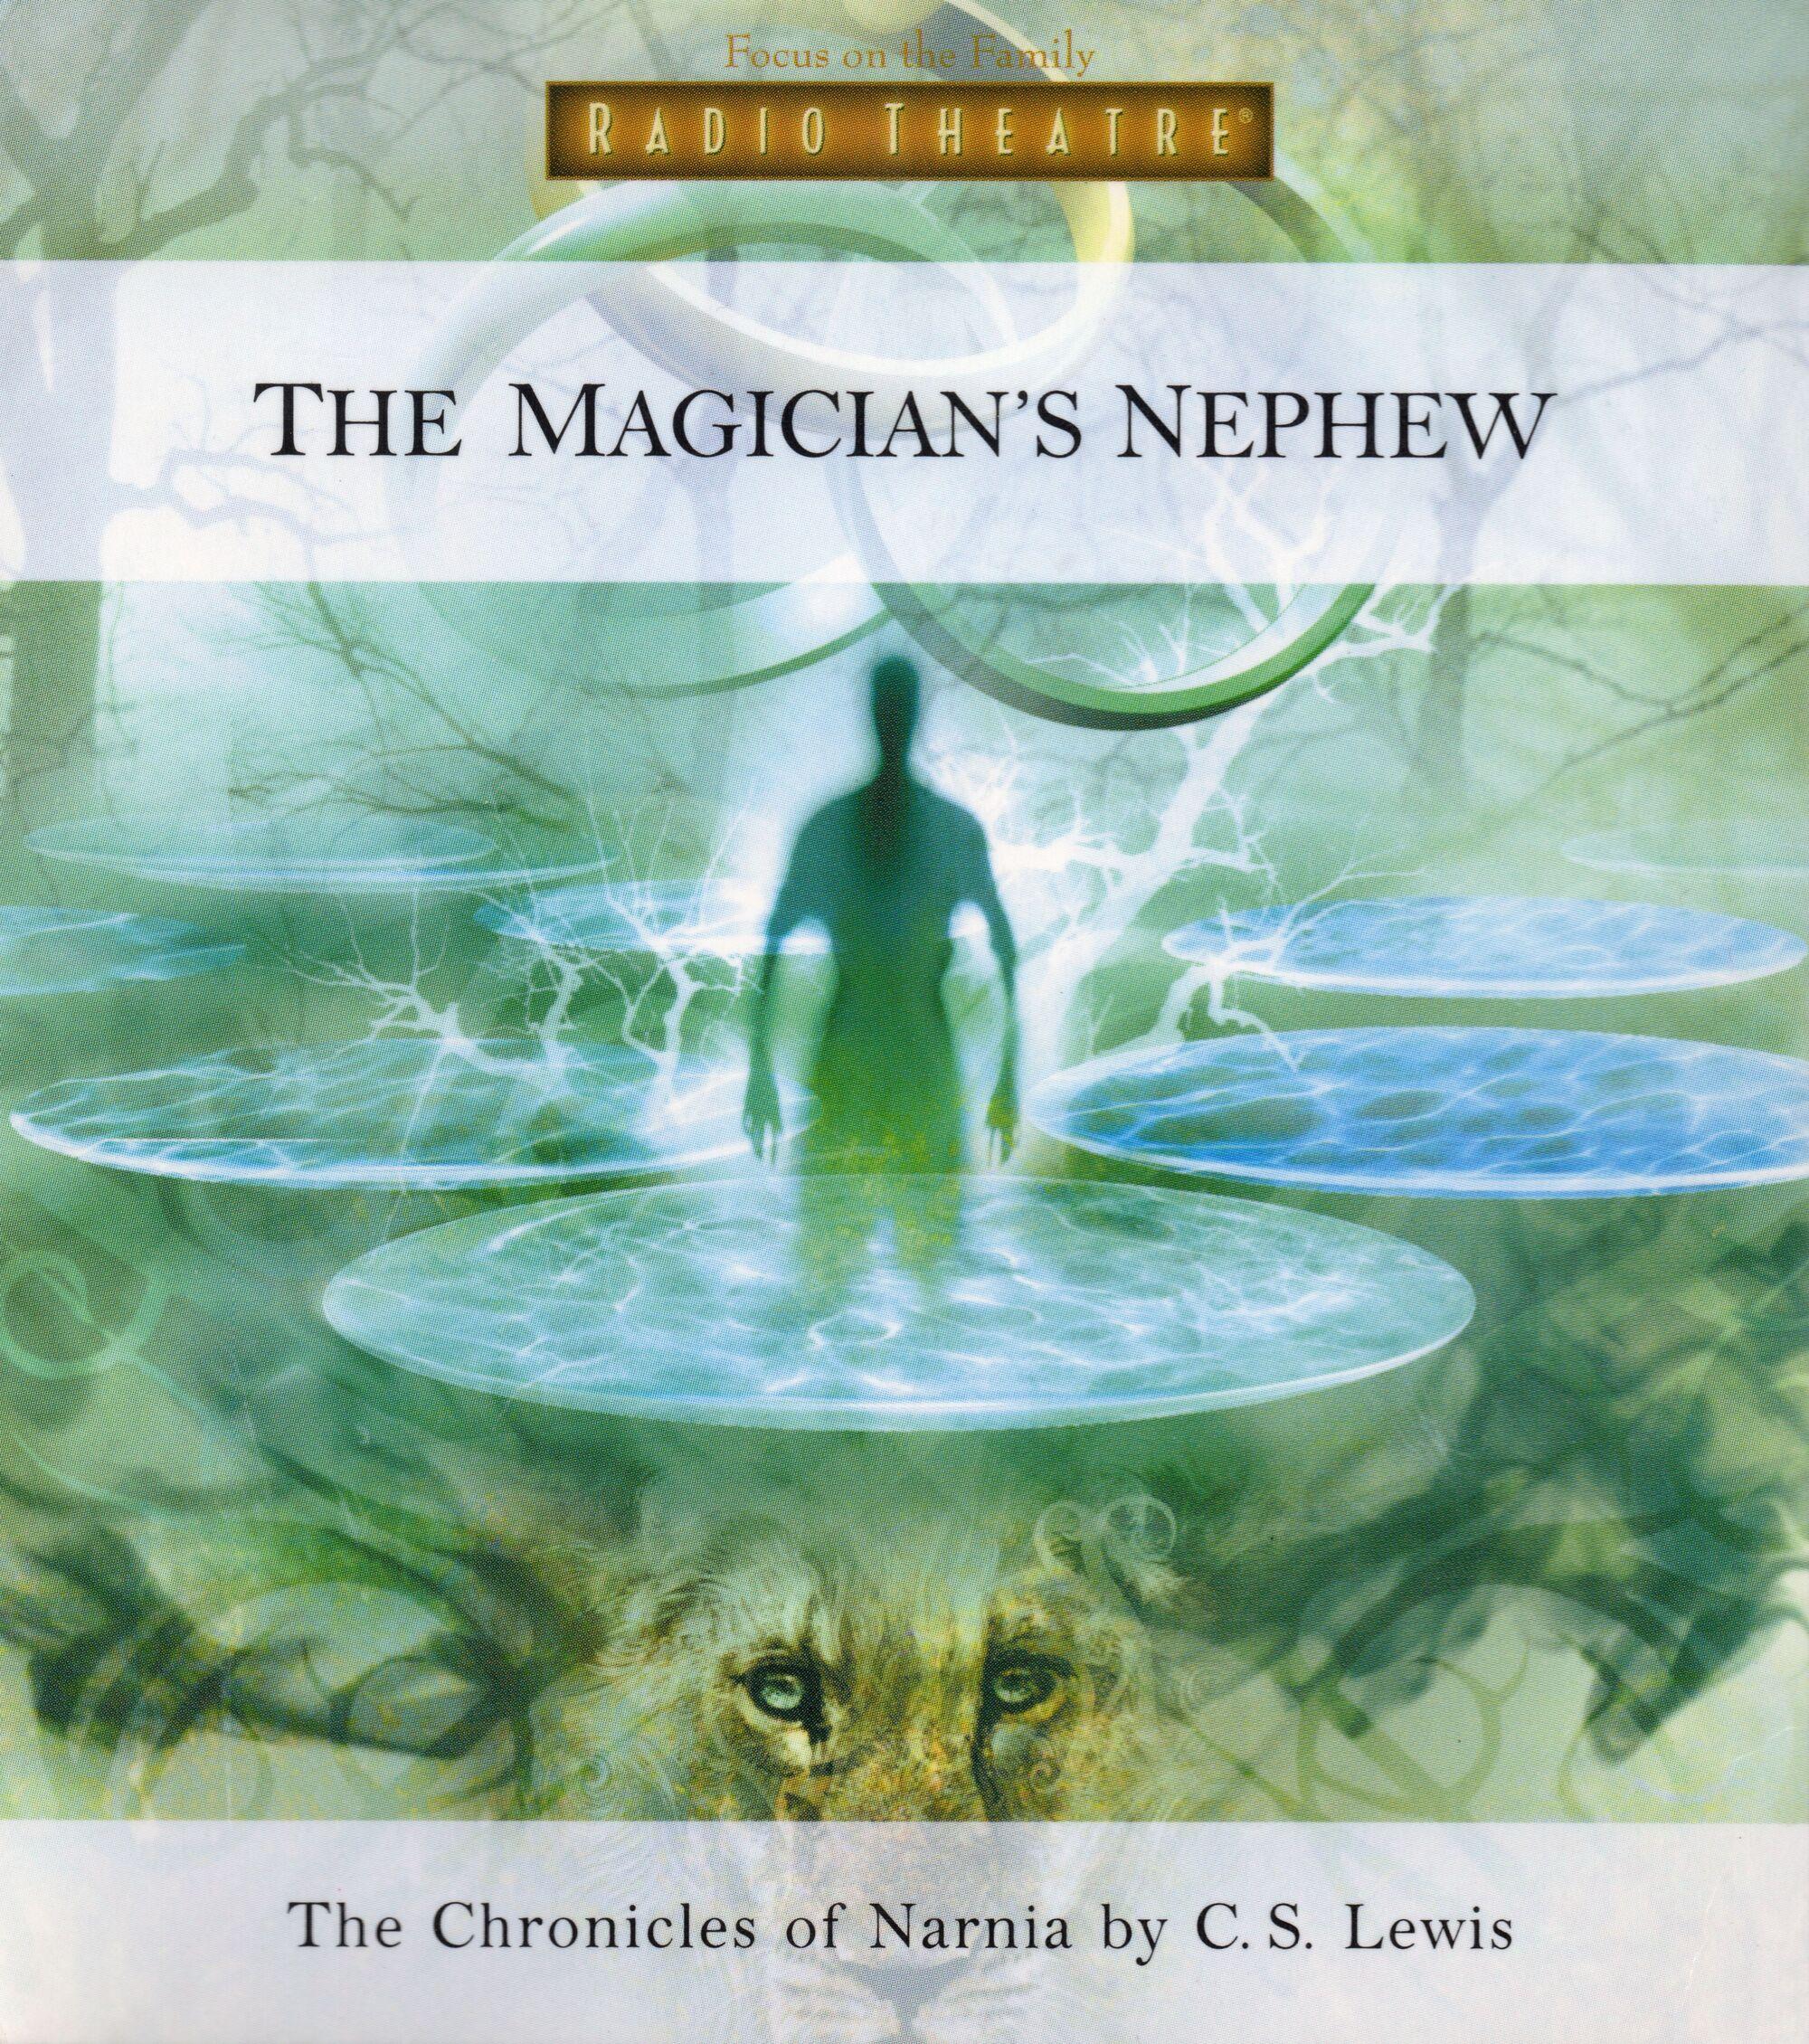 The Magician s Nephew Focus on the Family Radio Theatre